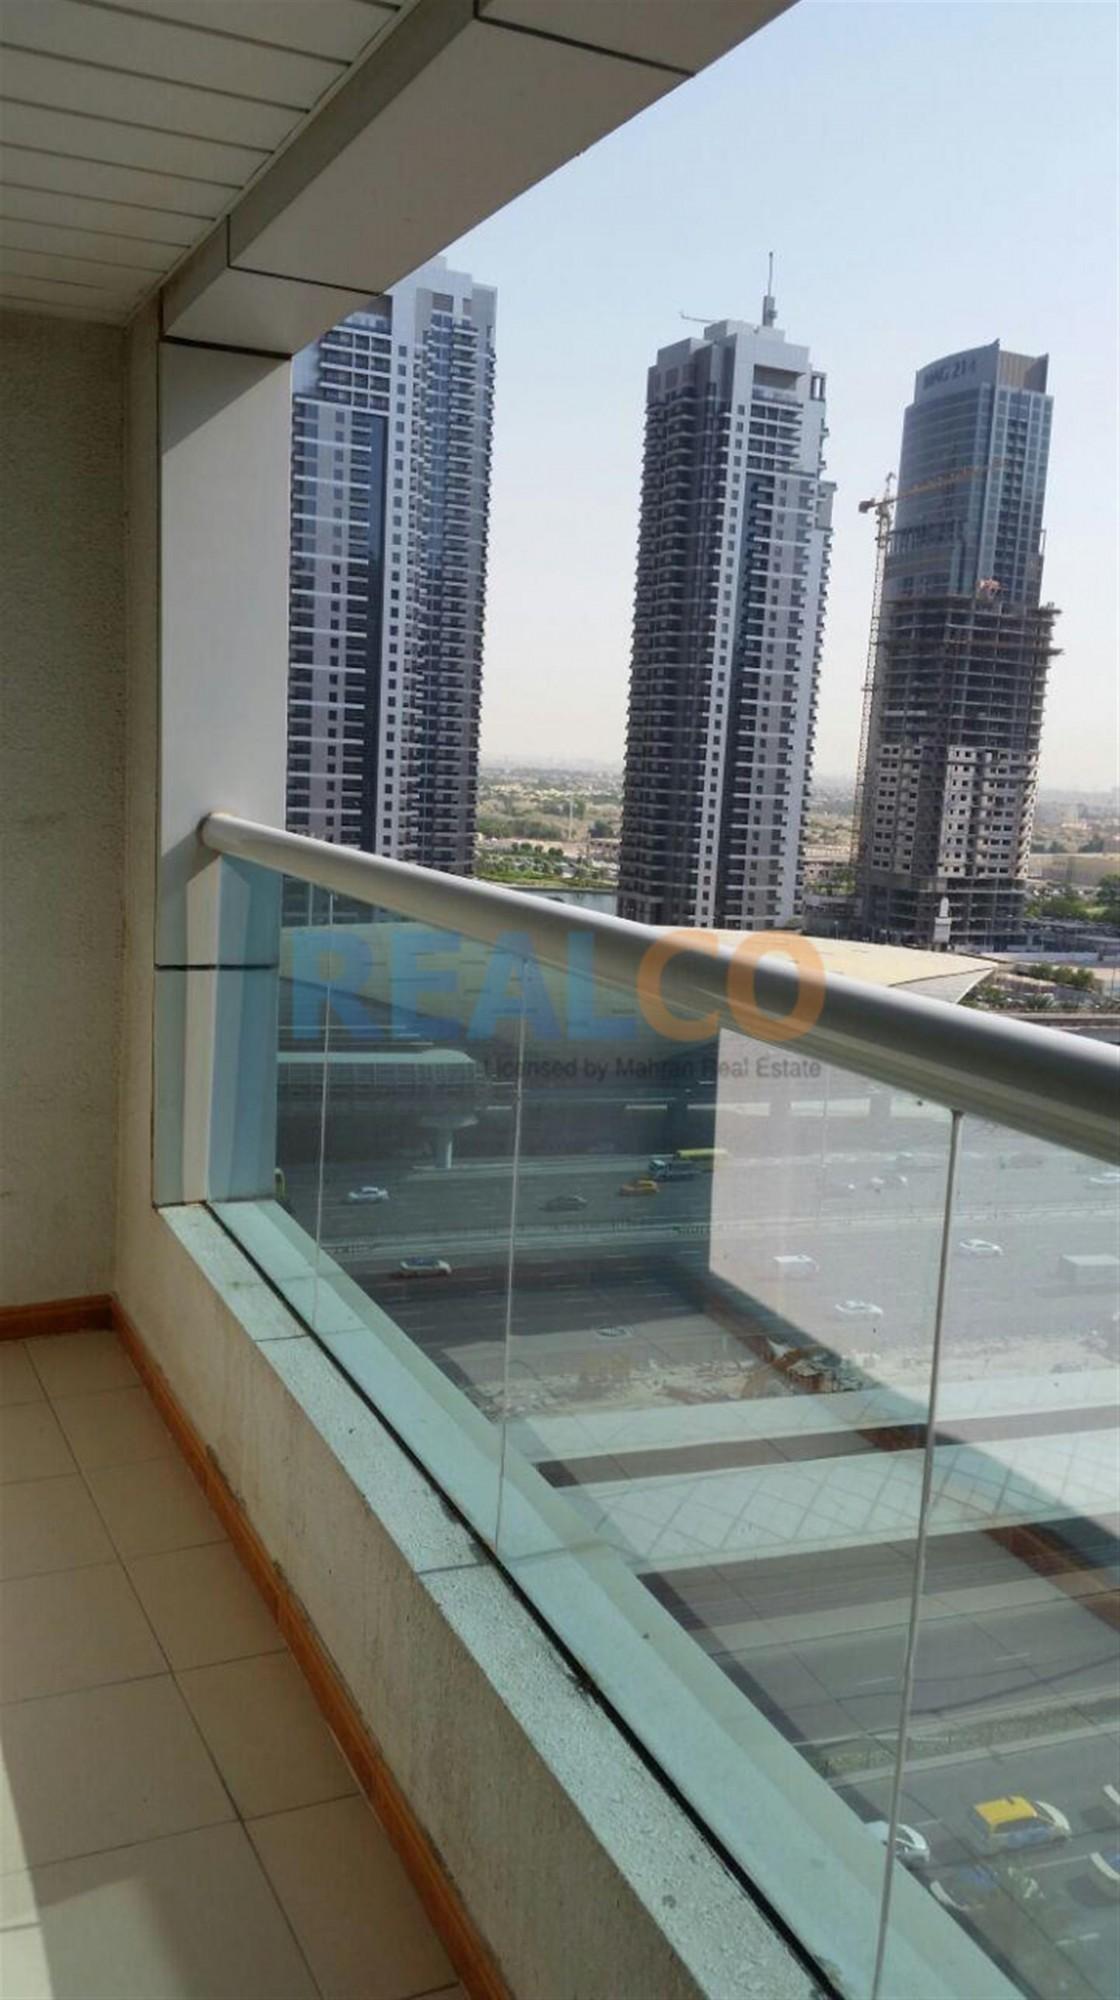 Distress Deal 1 BHK in Dubai Marina 770,000/- A Minute Away from Metro